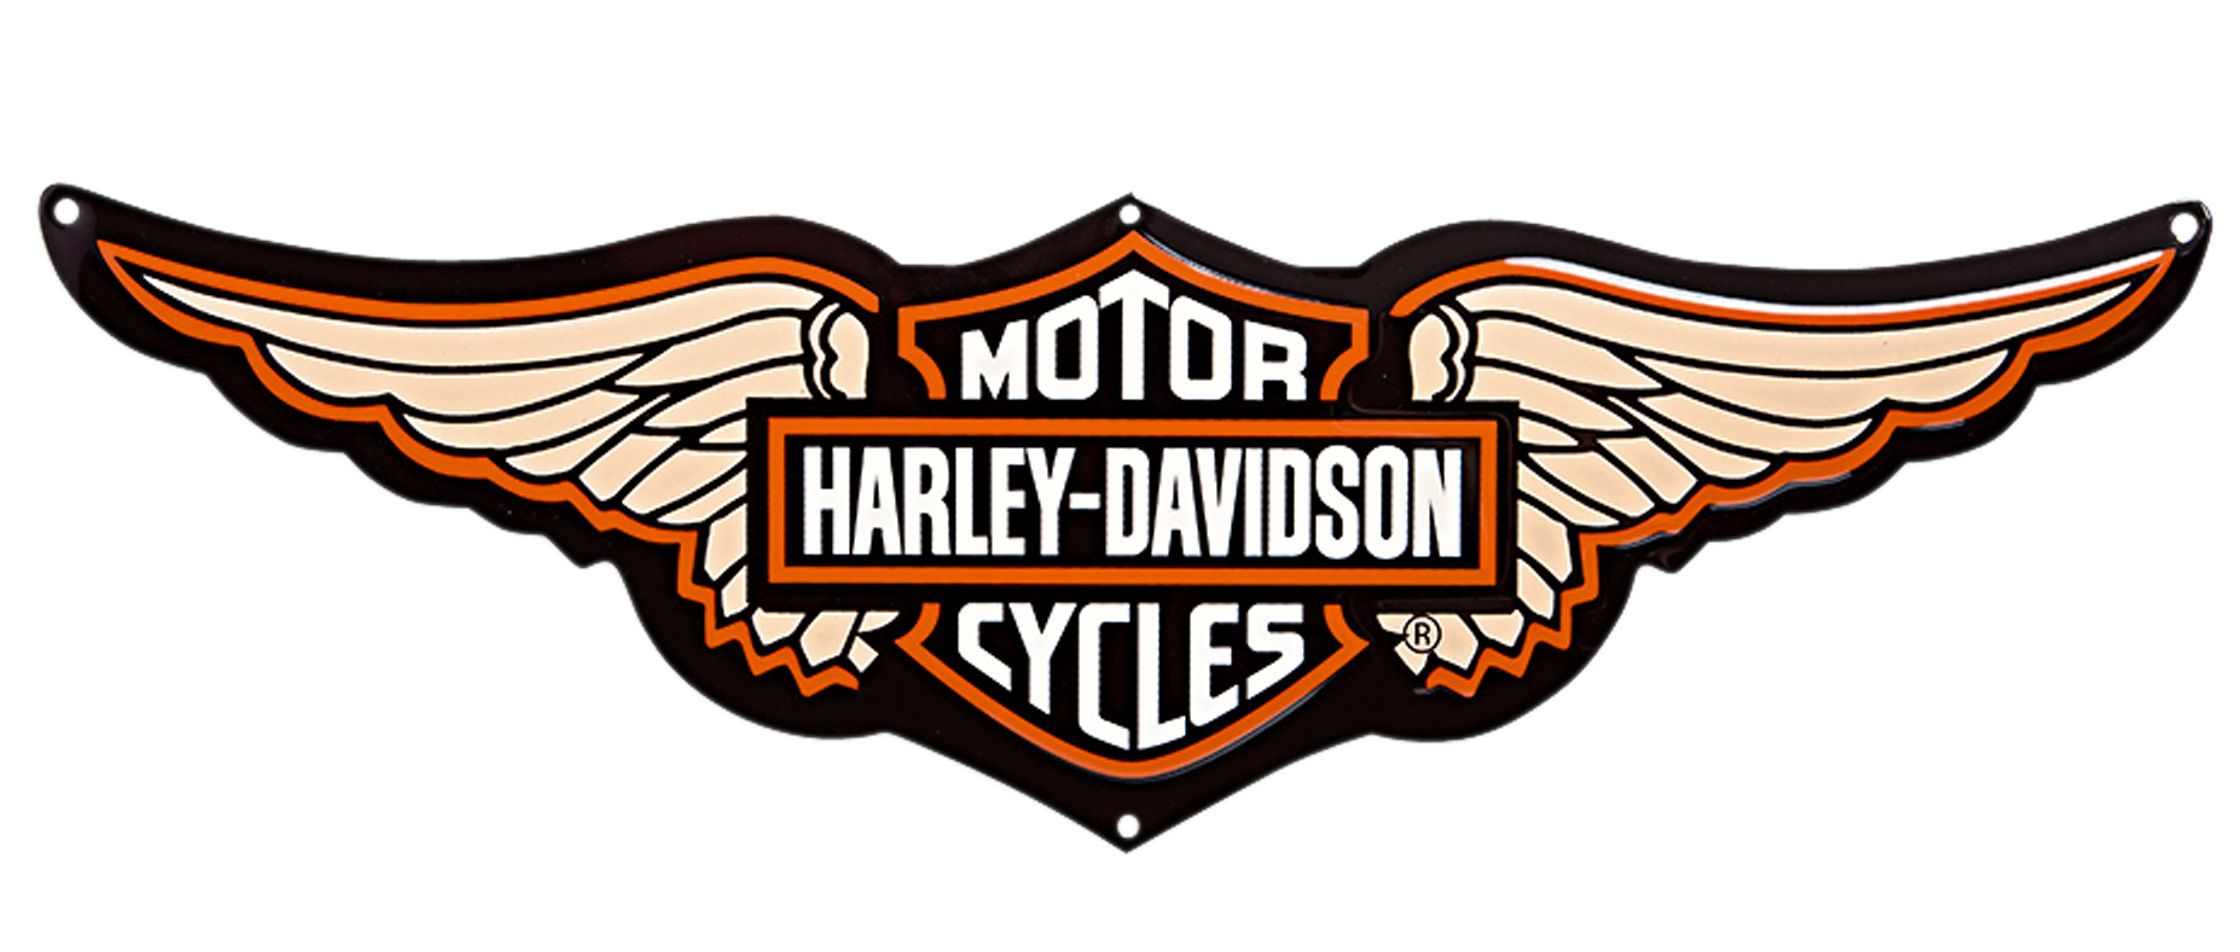 Harley Davidson S Iconic Logo Rich In Symbolism Harley Davidson Painting Harley Davidson Logo Classic Harley Davidson